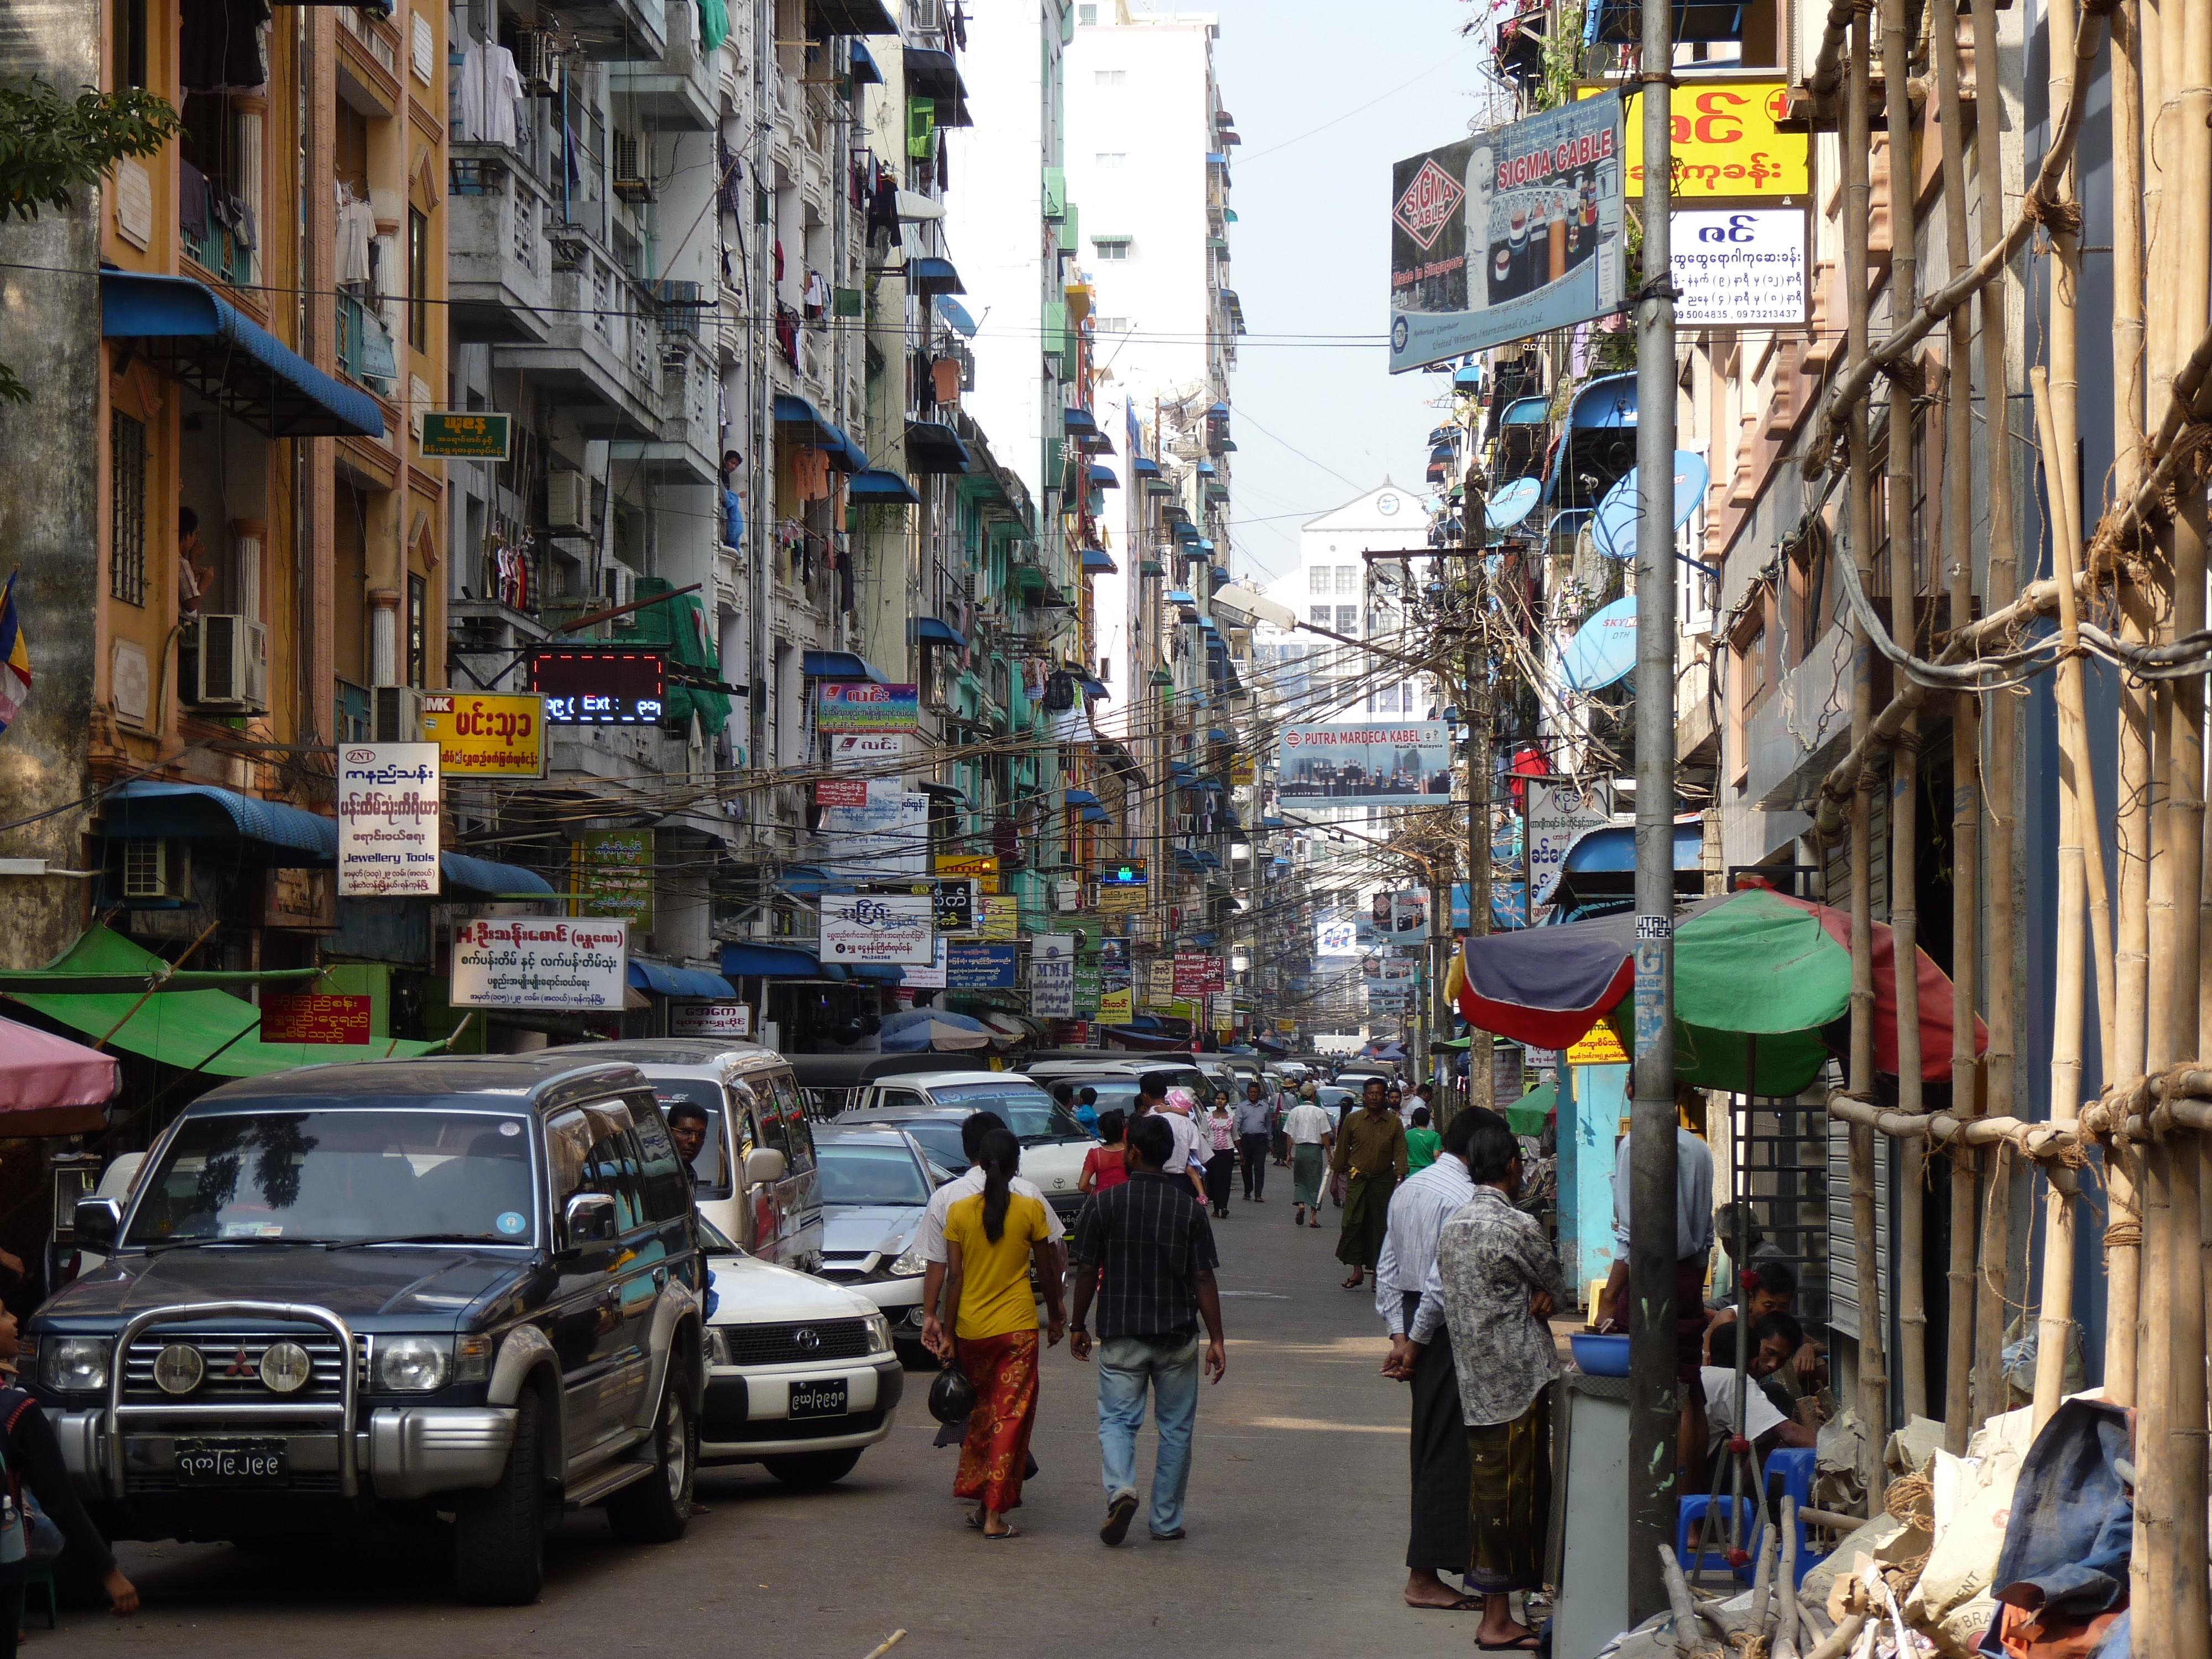 Streets of Yangon (By Dudva)